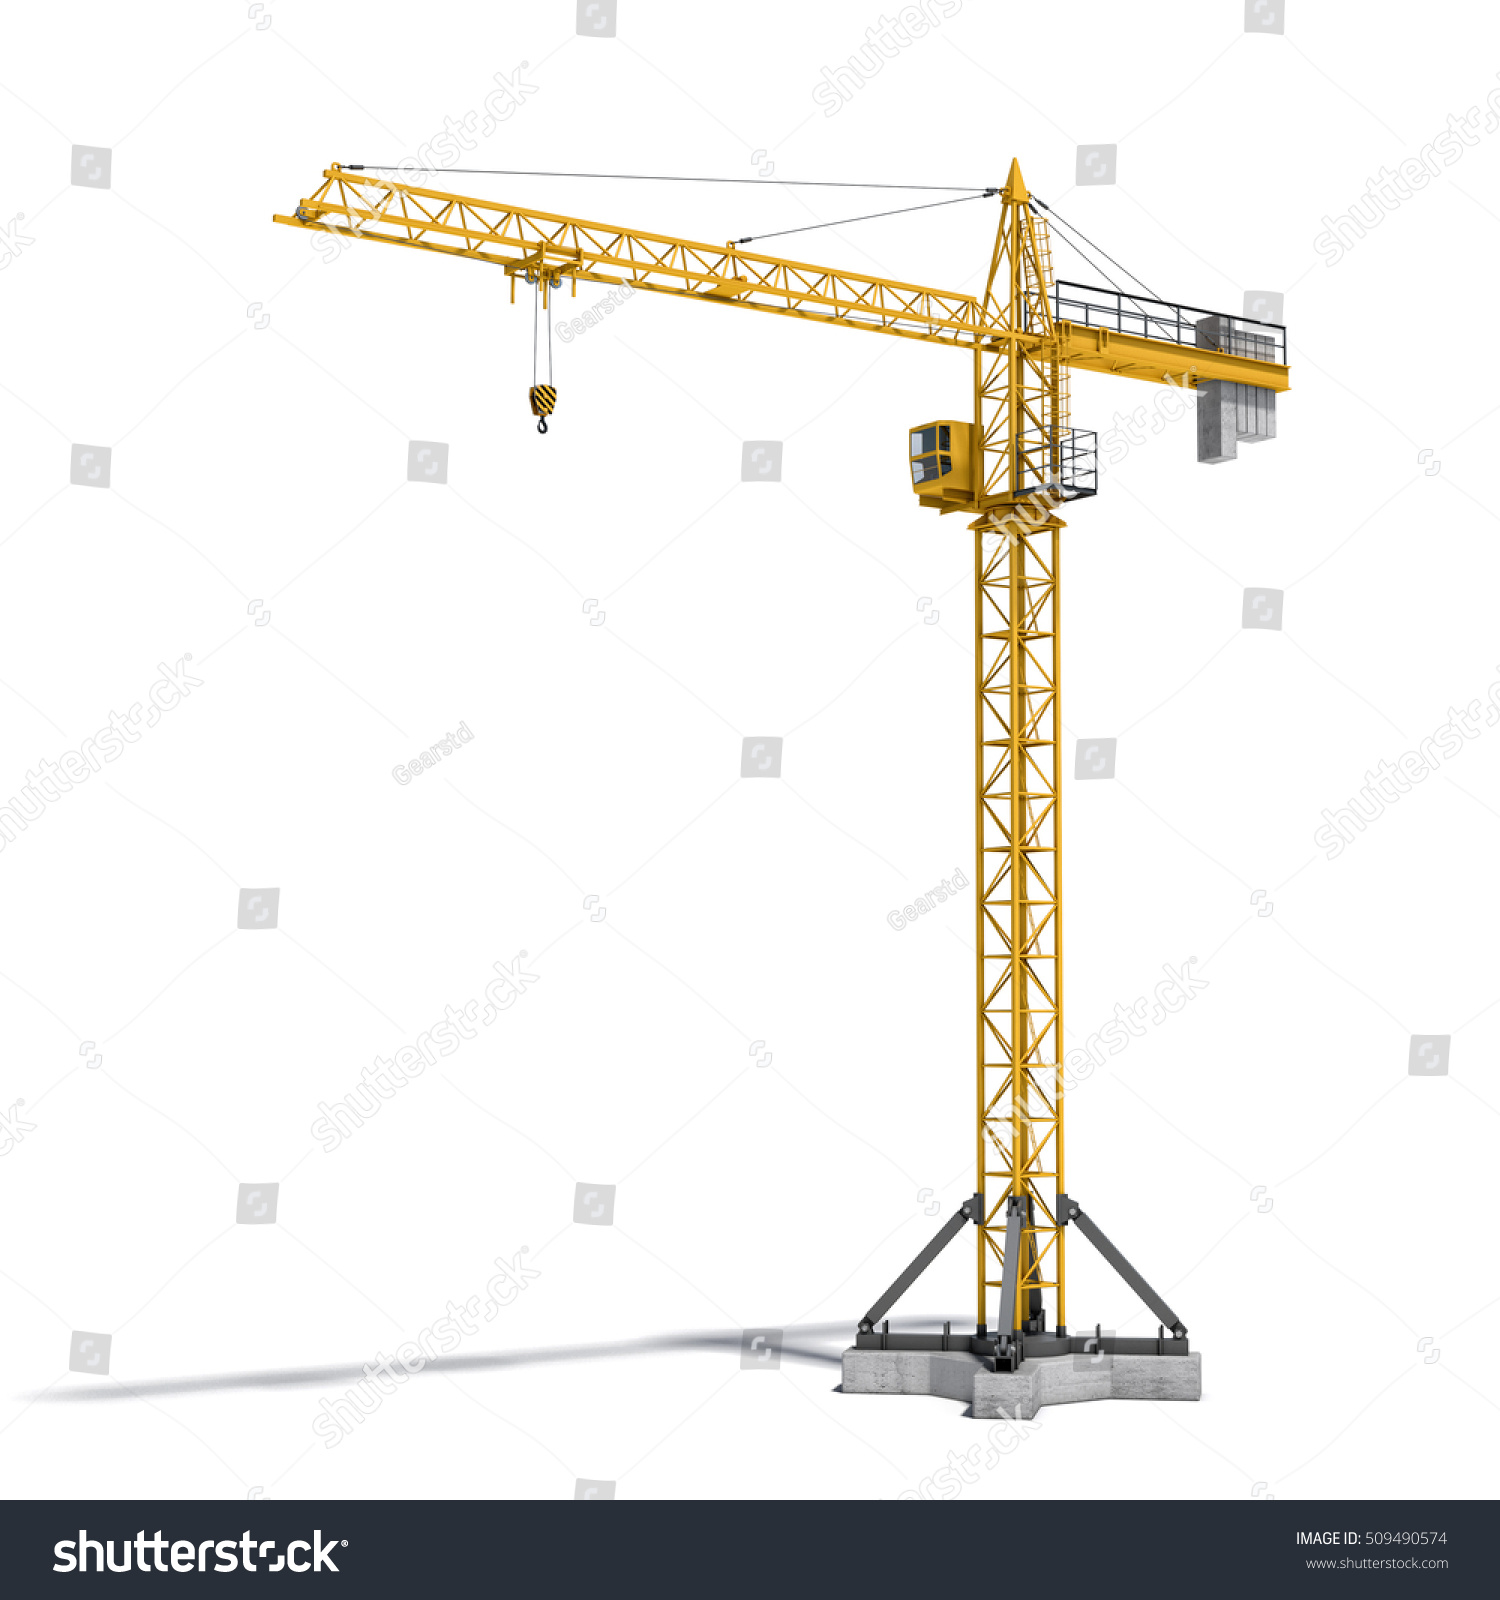 Tower Crane Design : D rendering yellow tower crane fullheight stock